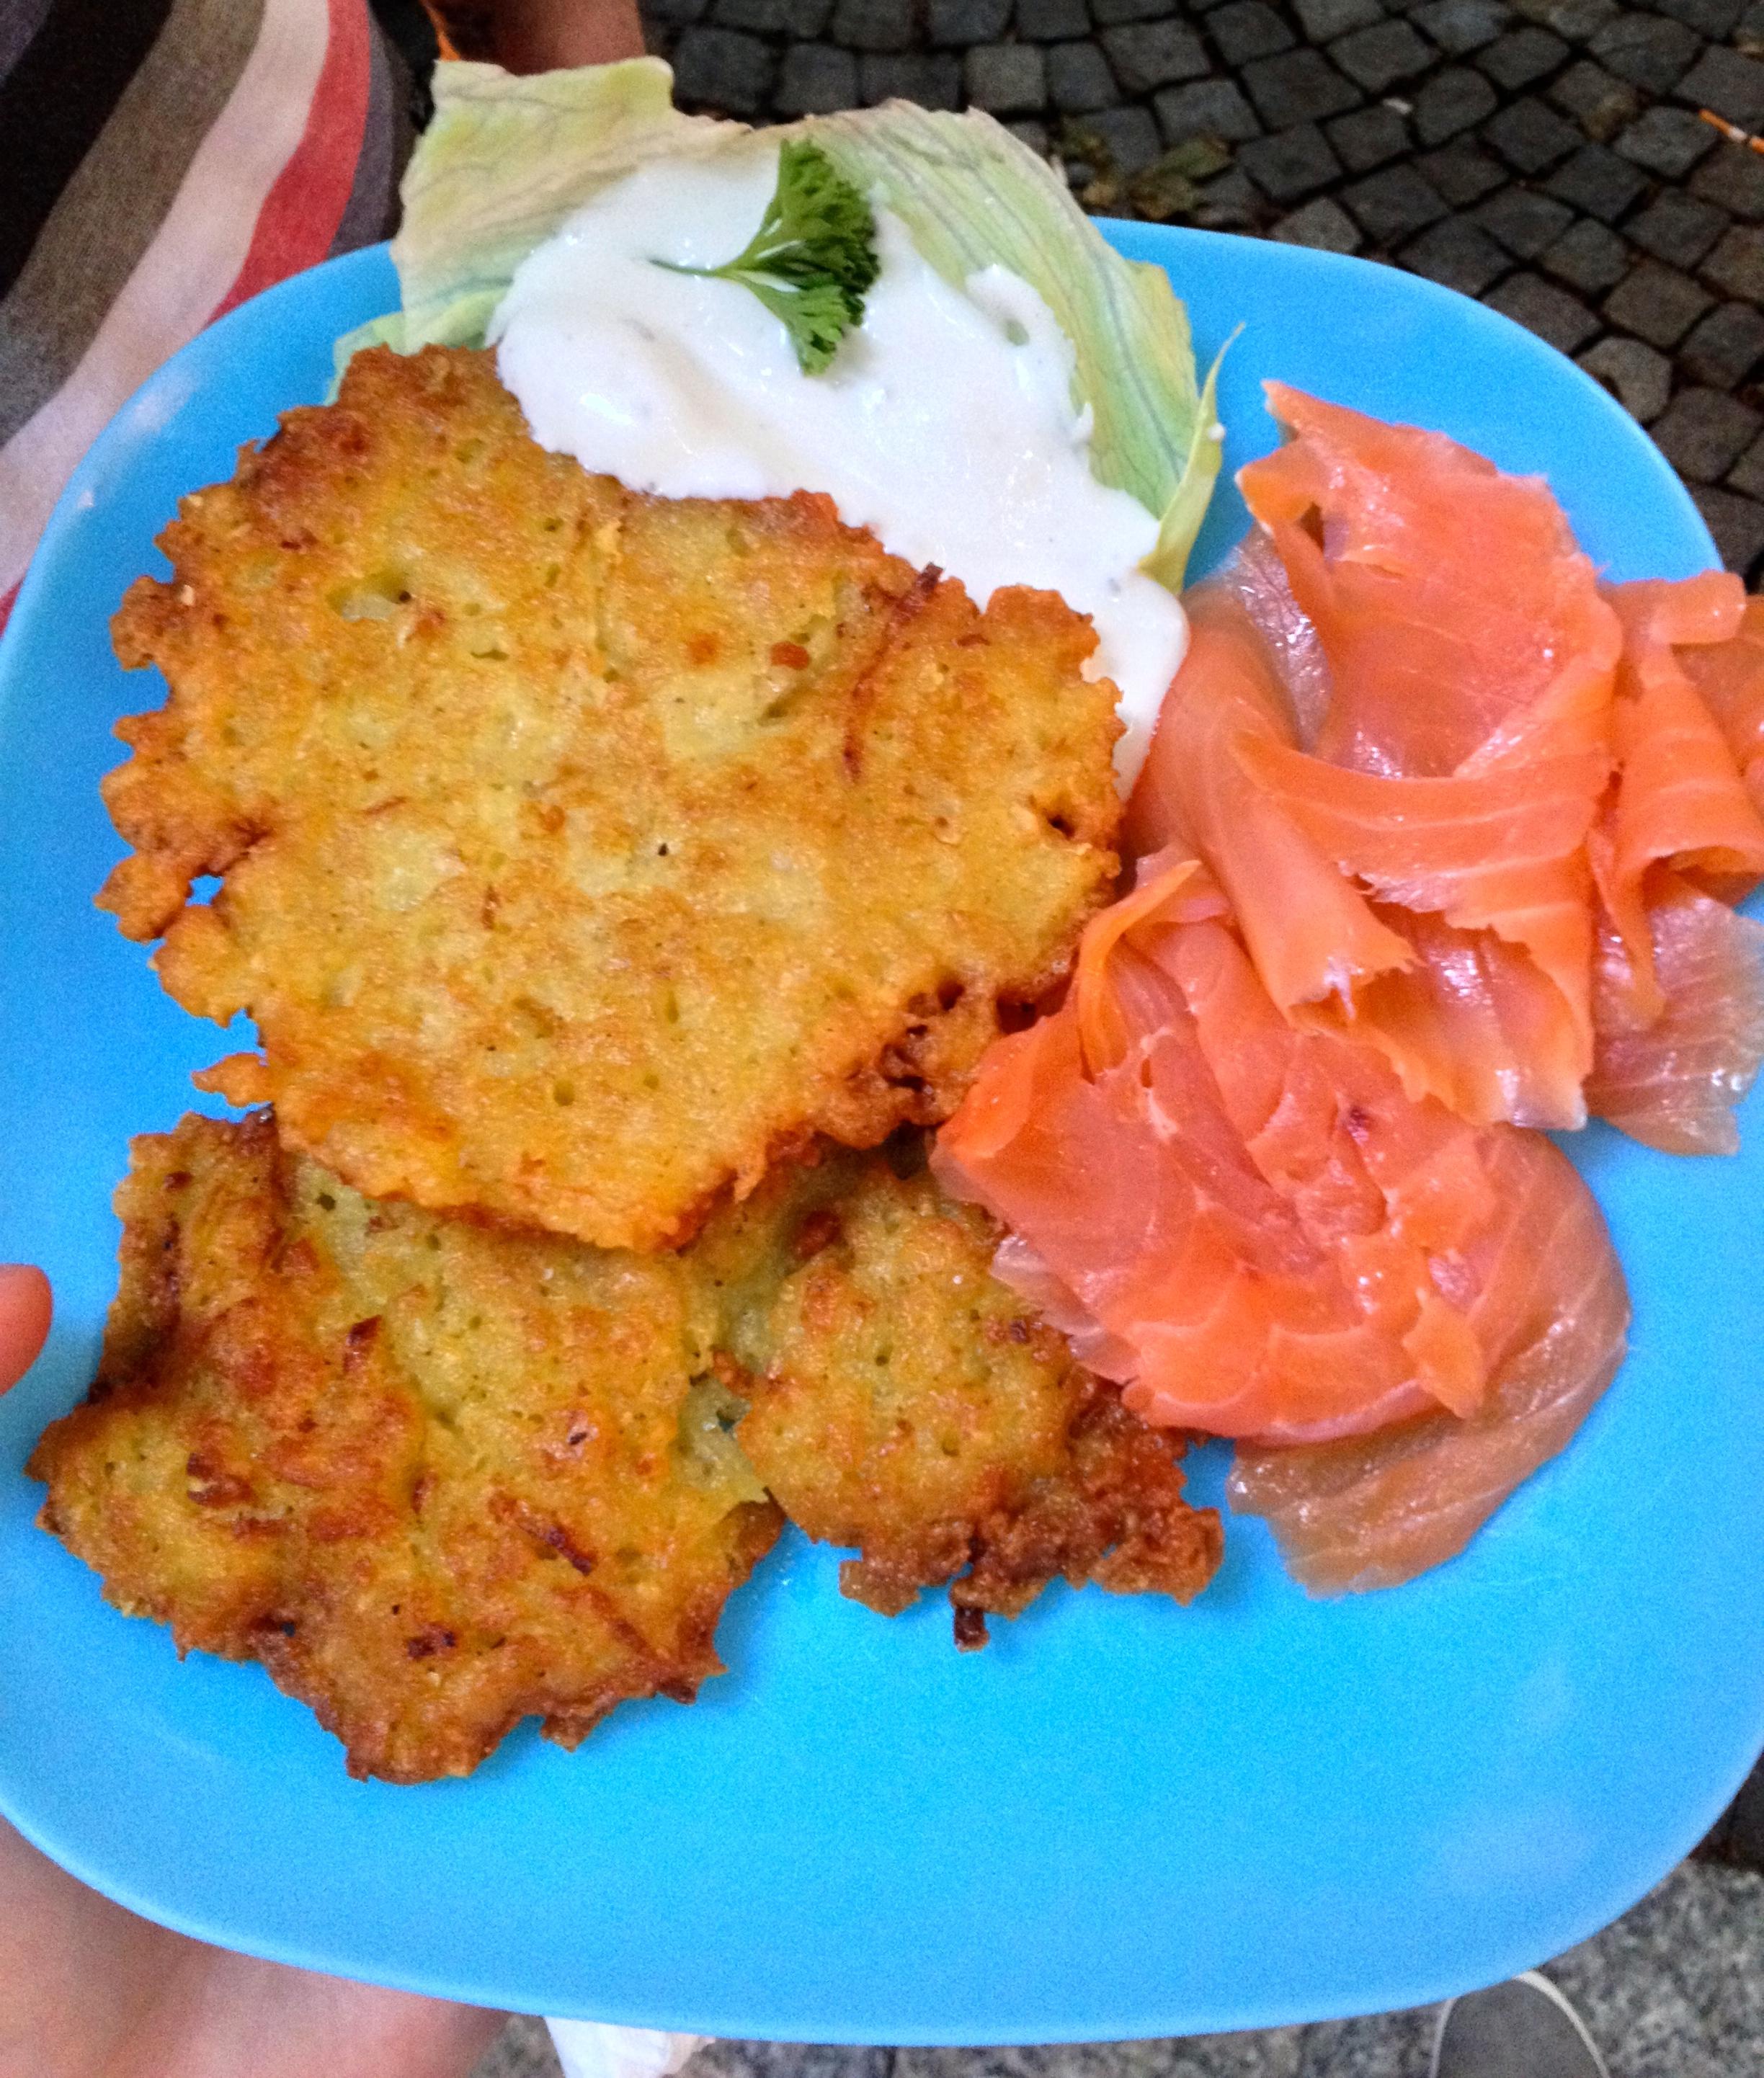 Kartoffelpuffer (fried potato pancakes) with smoked salmon and sour cream